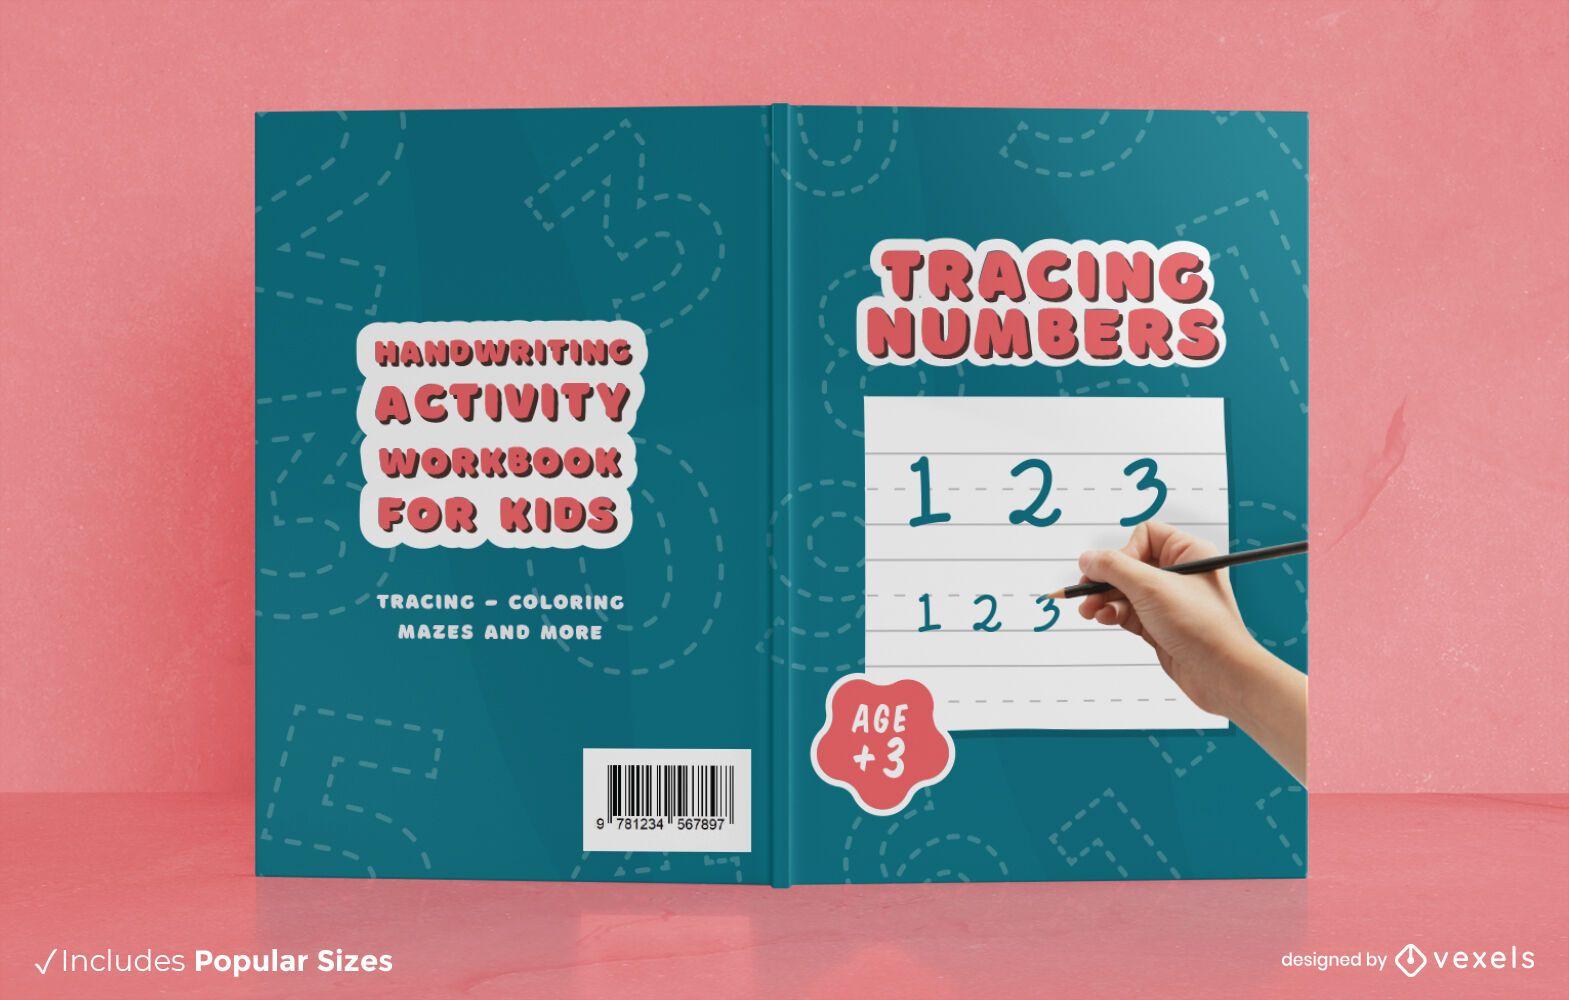 Handwriting activity book cover design